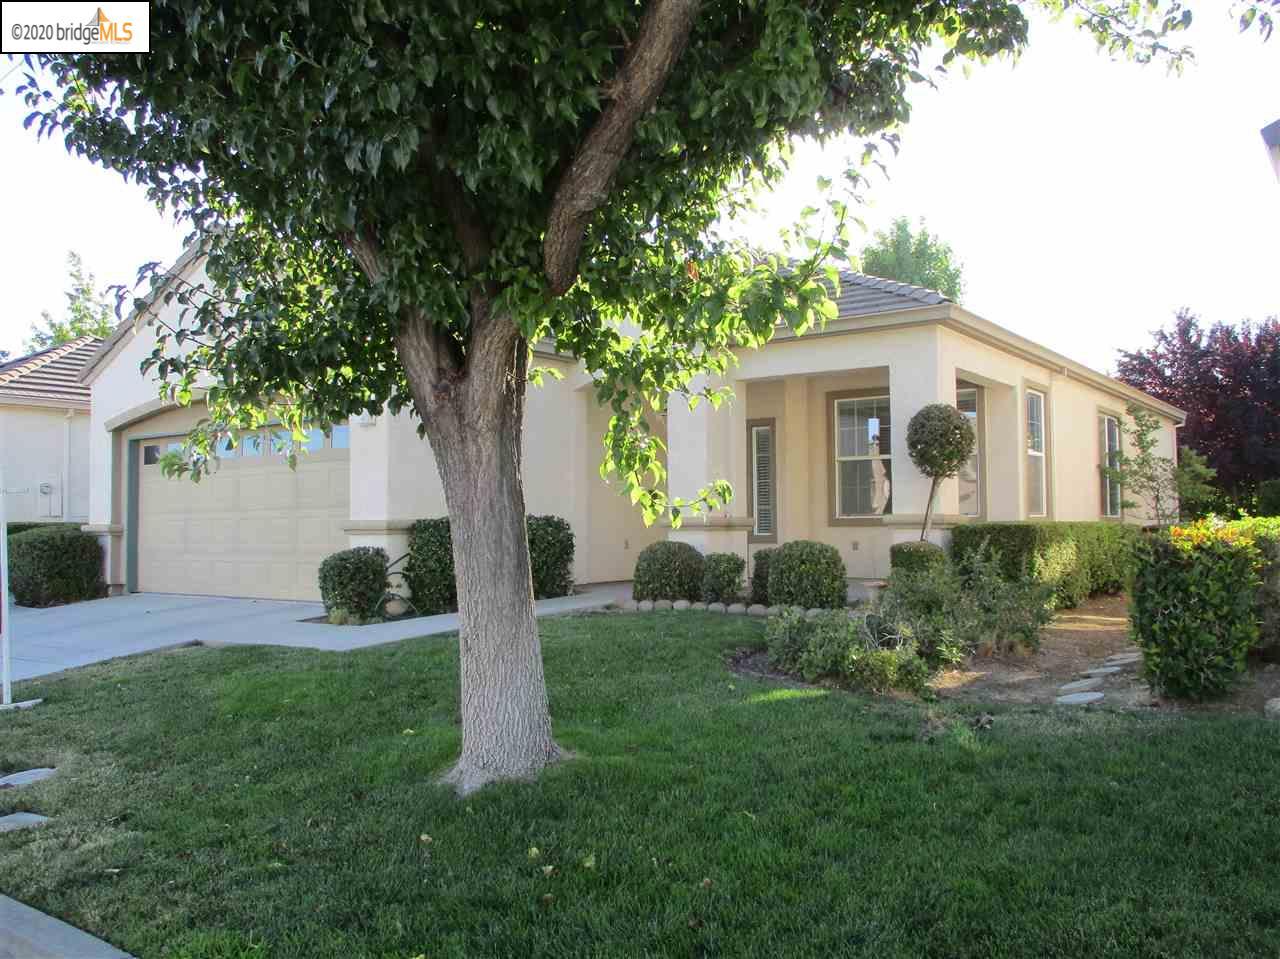 659 Prince Albert Way, BRENTWOOD, CA 94513